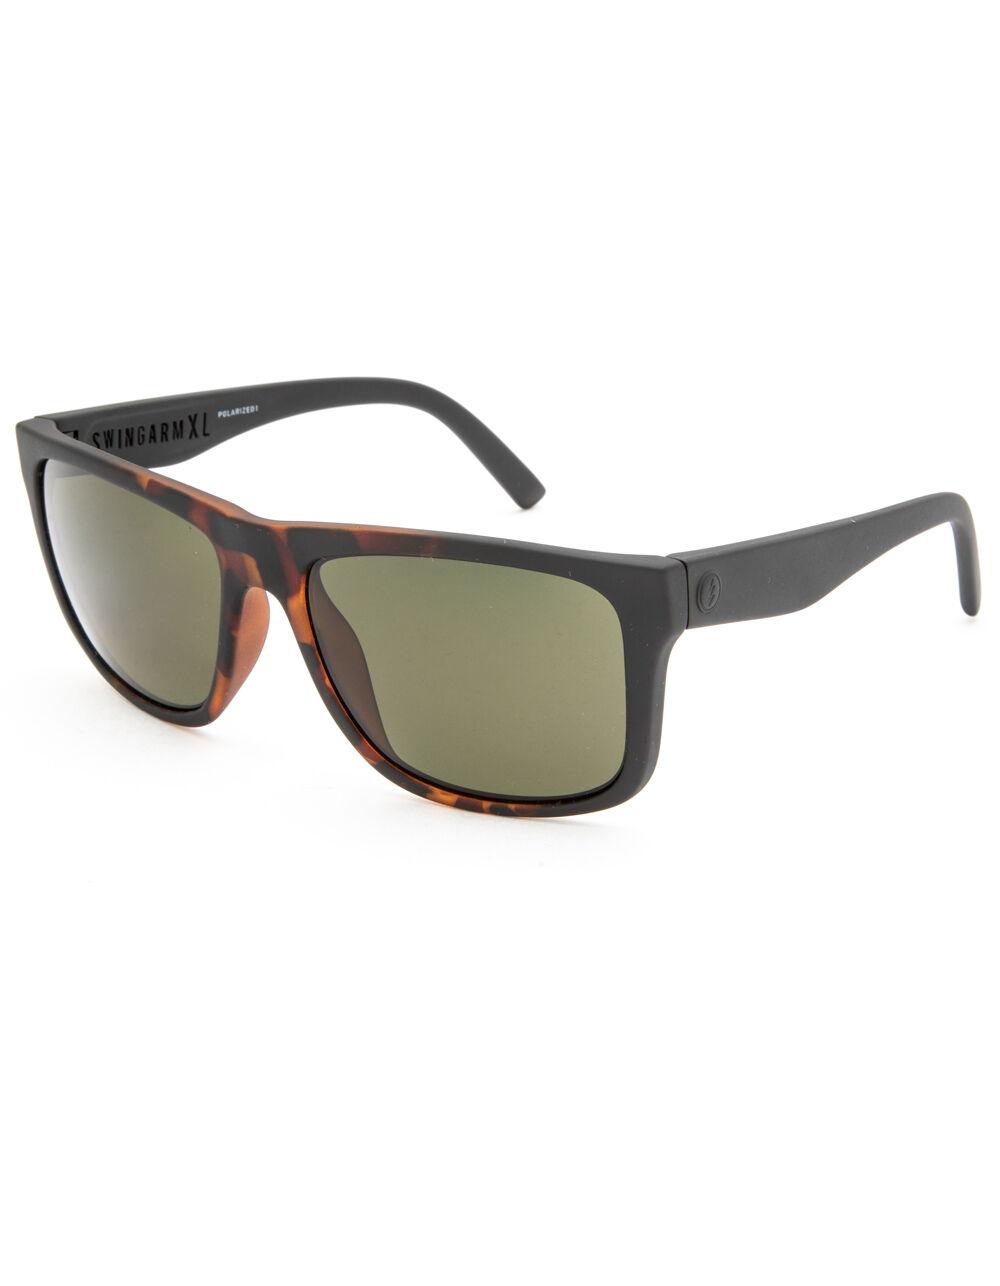 ELECTRIC Swingarm XL Matte Tortoise Polarized Sunglasses